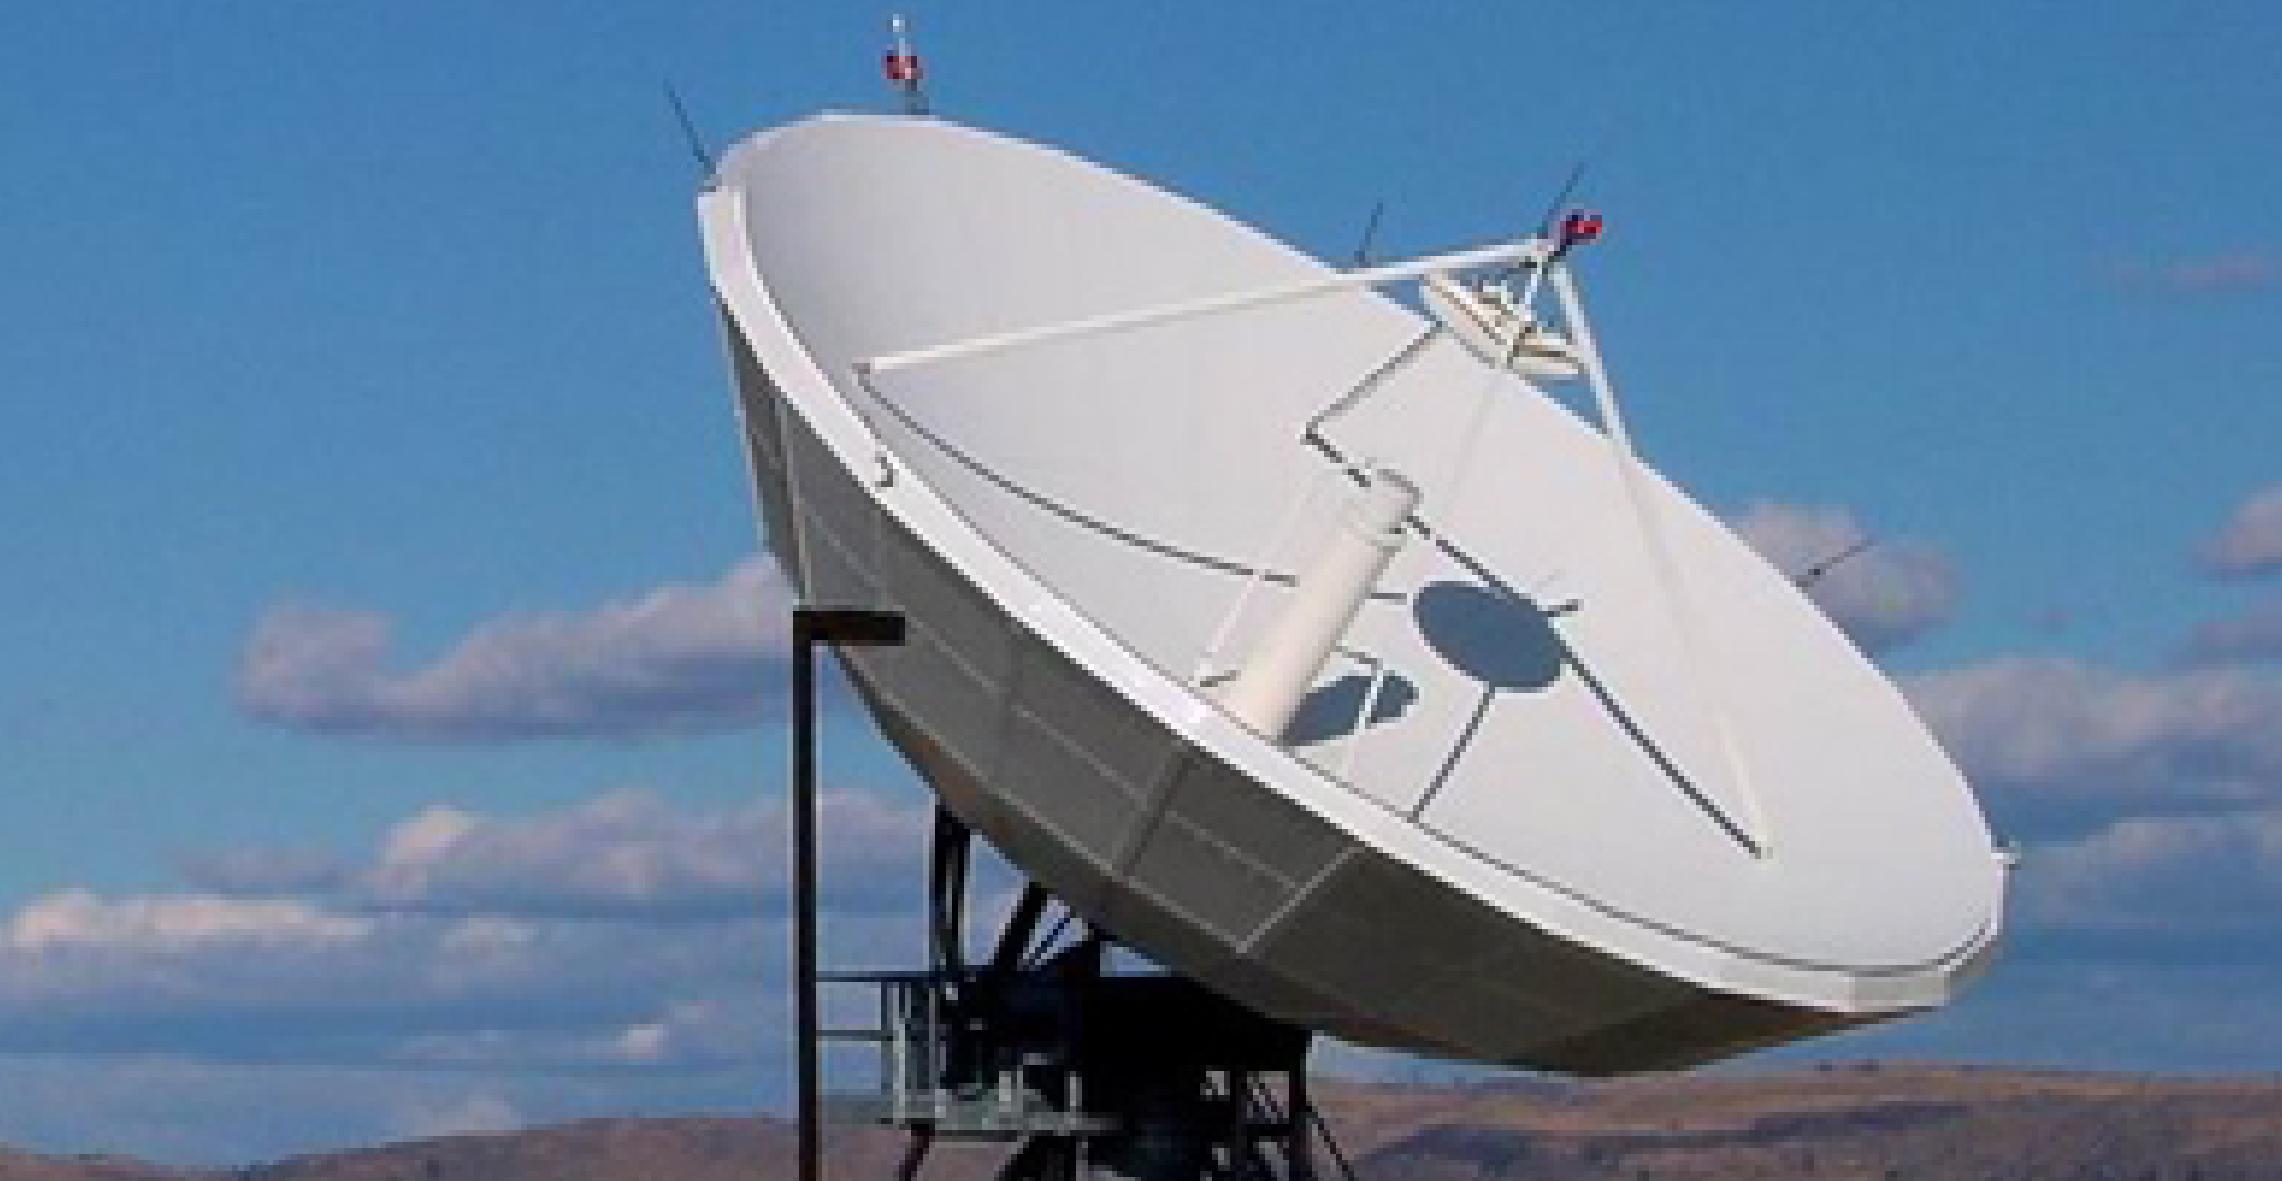 11.1m. Antenna